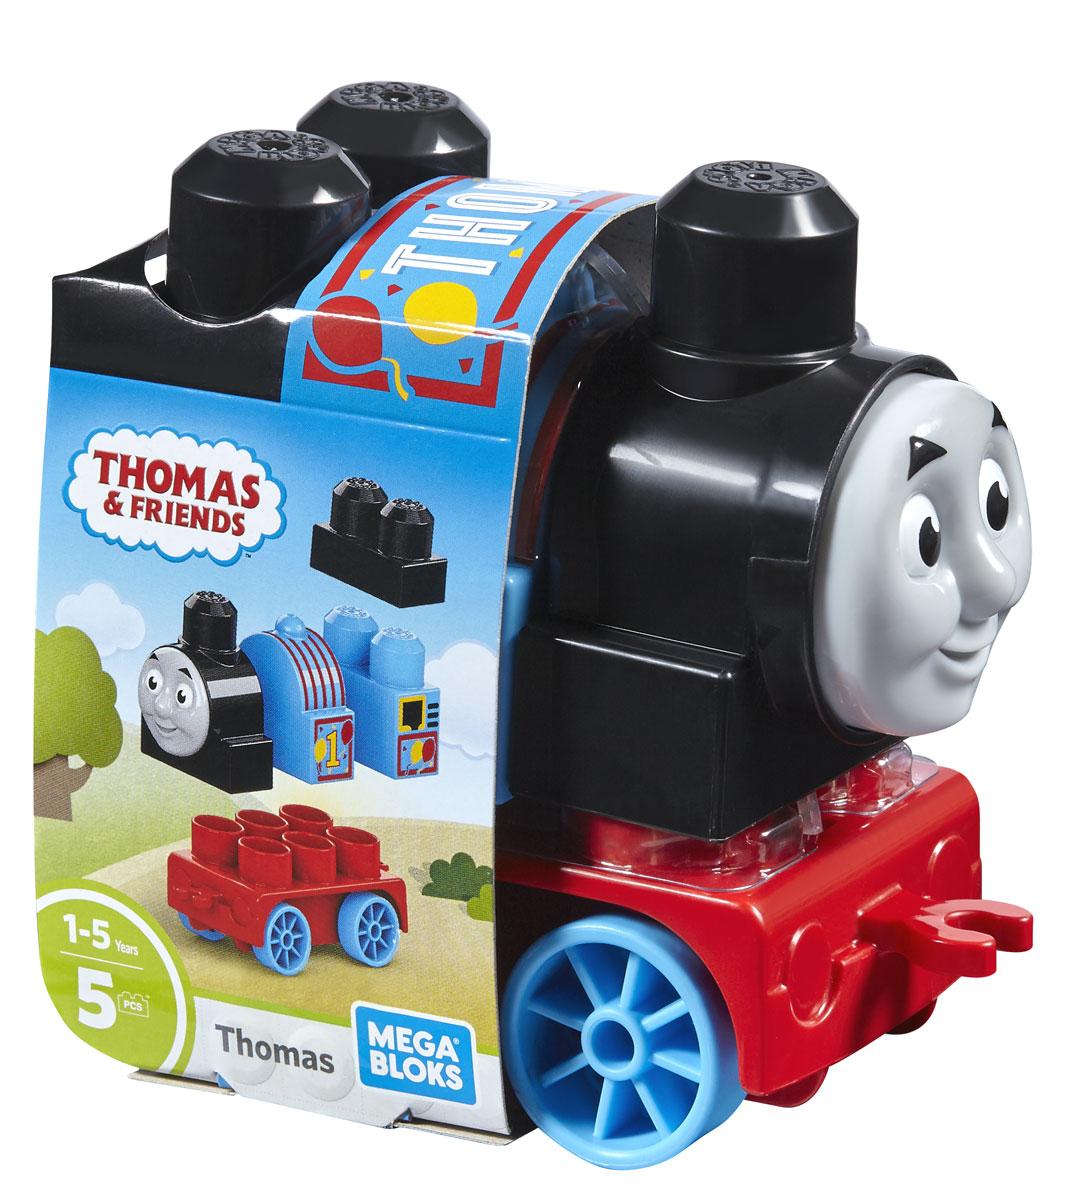 Mega Bloks Thomas & Friends Конструктор Паровозик Томас FFD61 mega bloks конструктор томас и друзья mega bloks dpj17